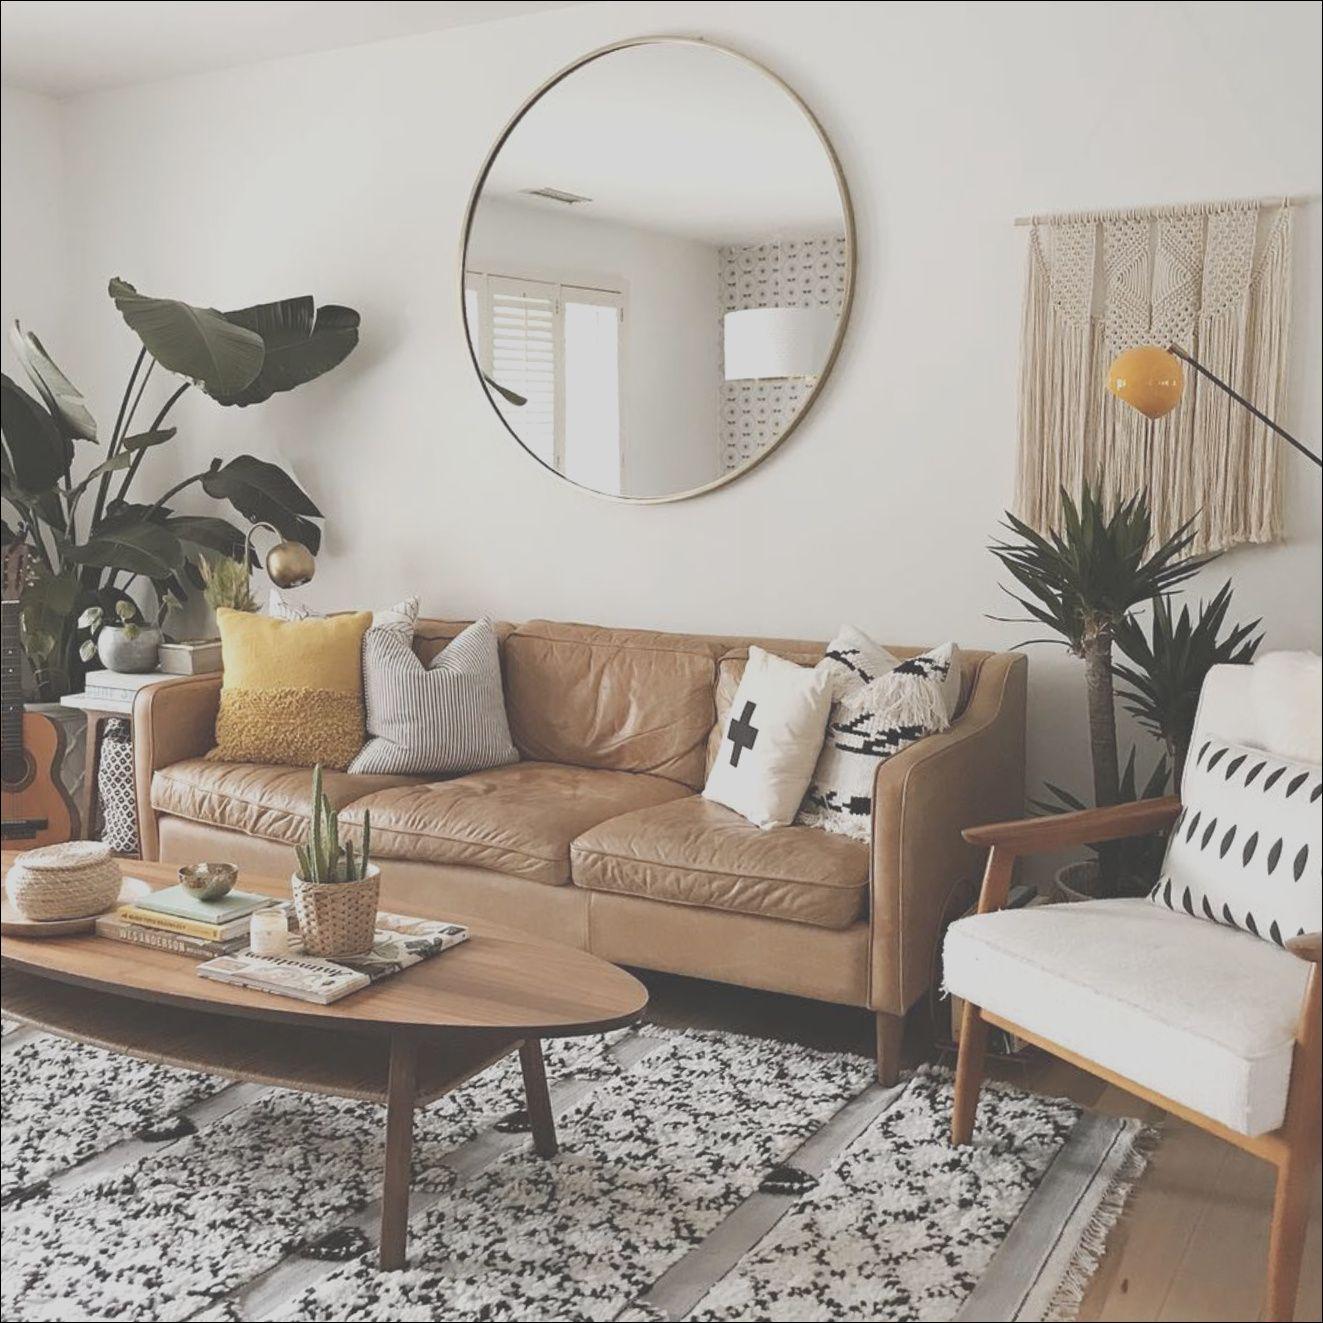 8 Astonishing Best Apartment Living Room Design Gallery In